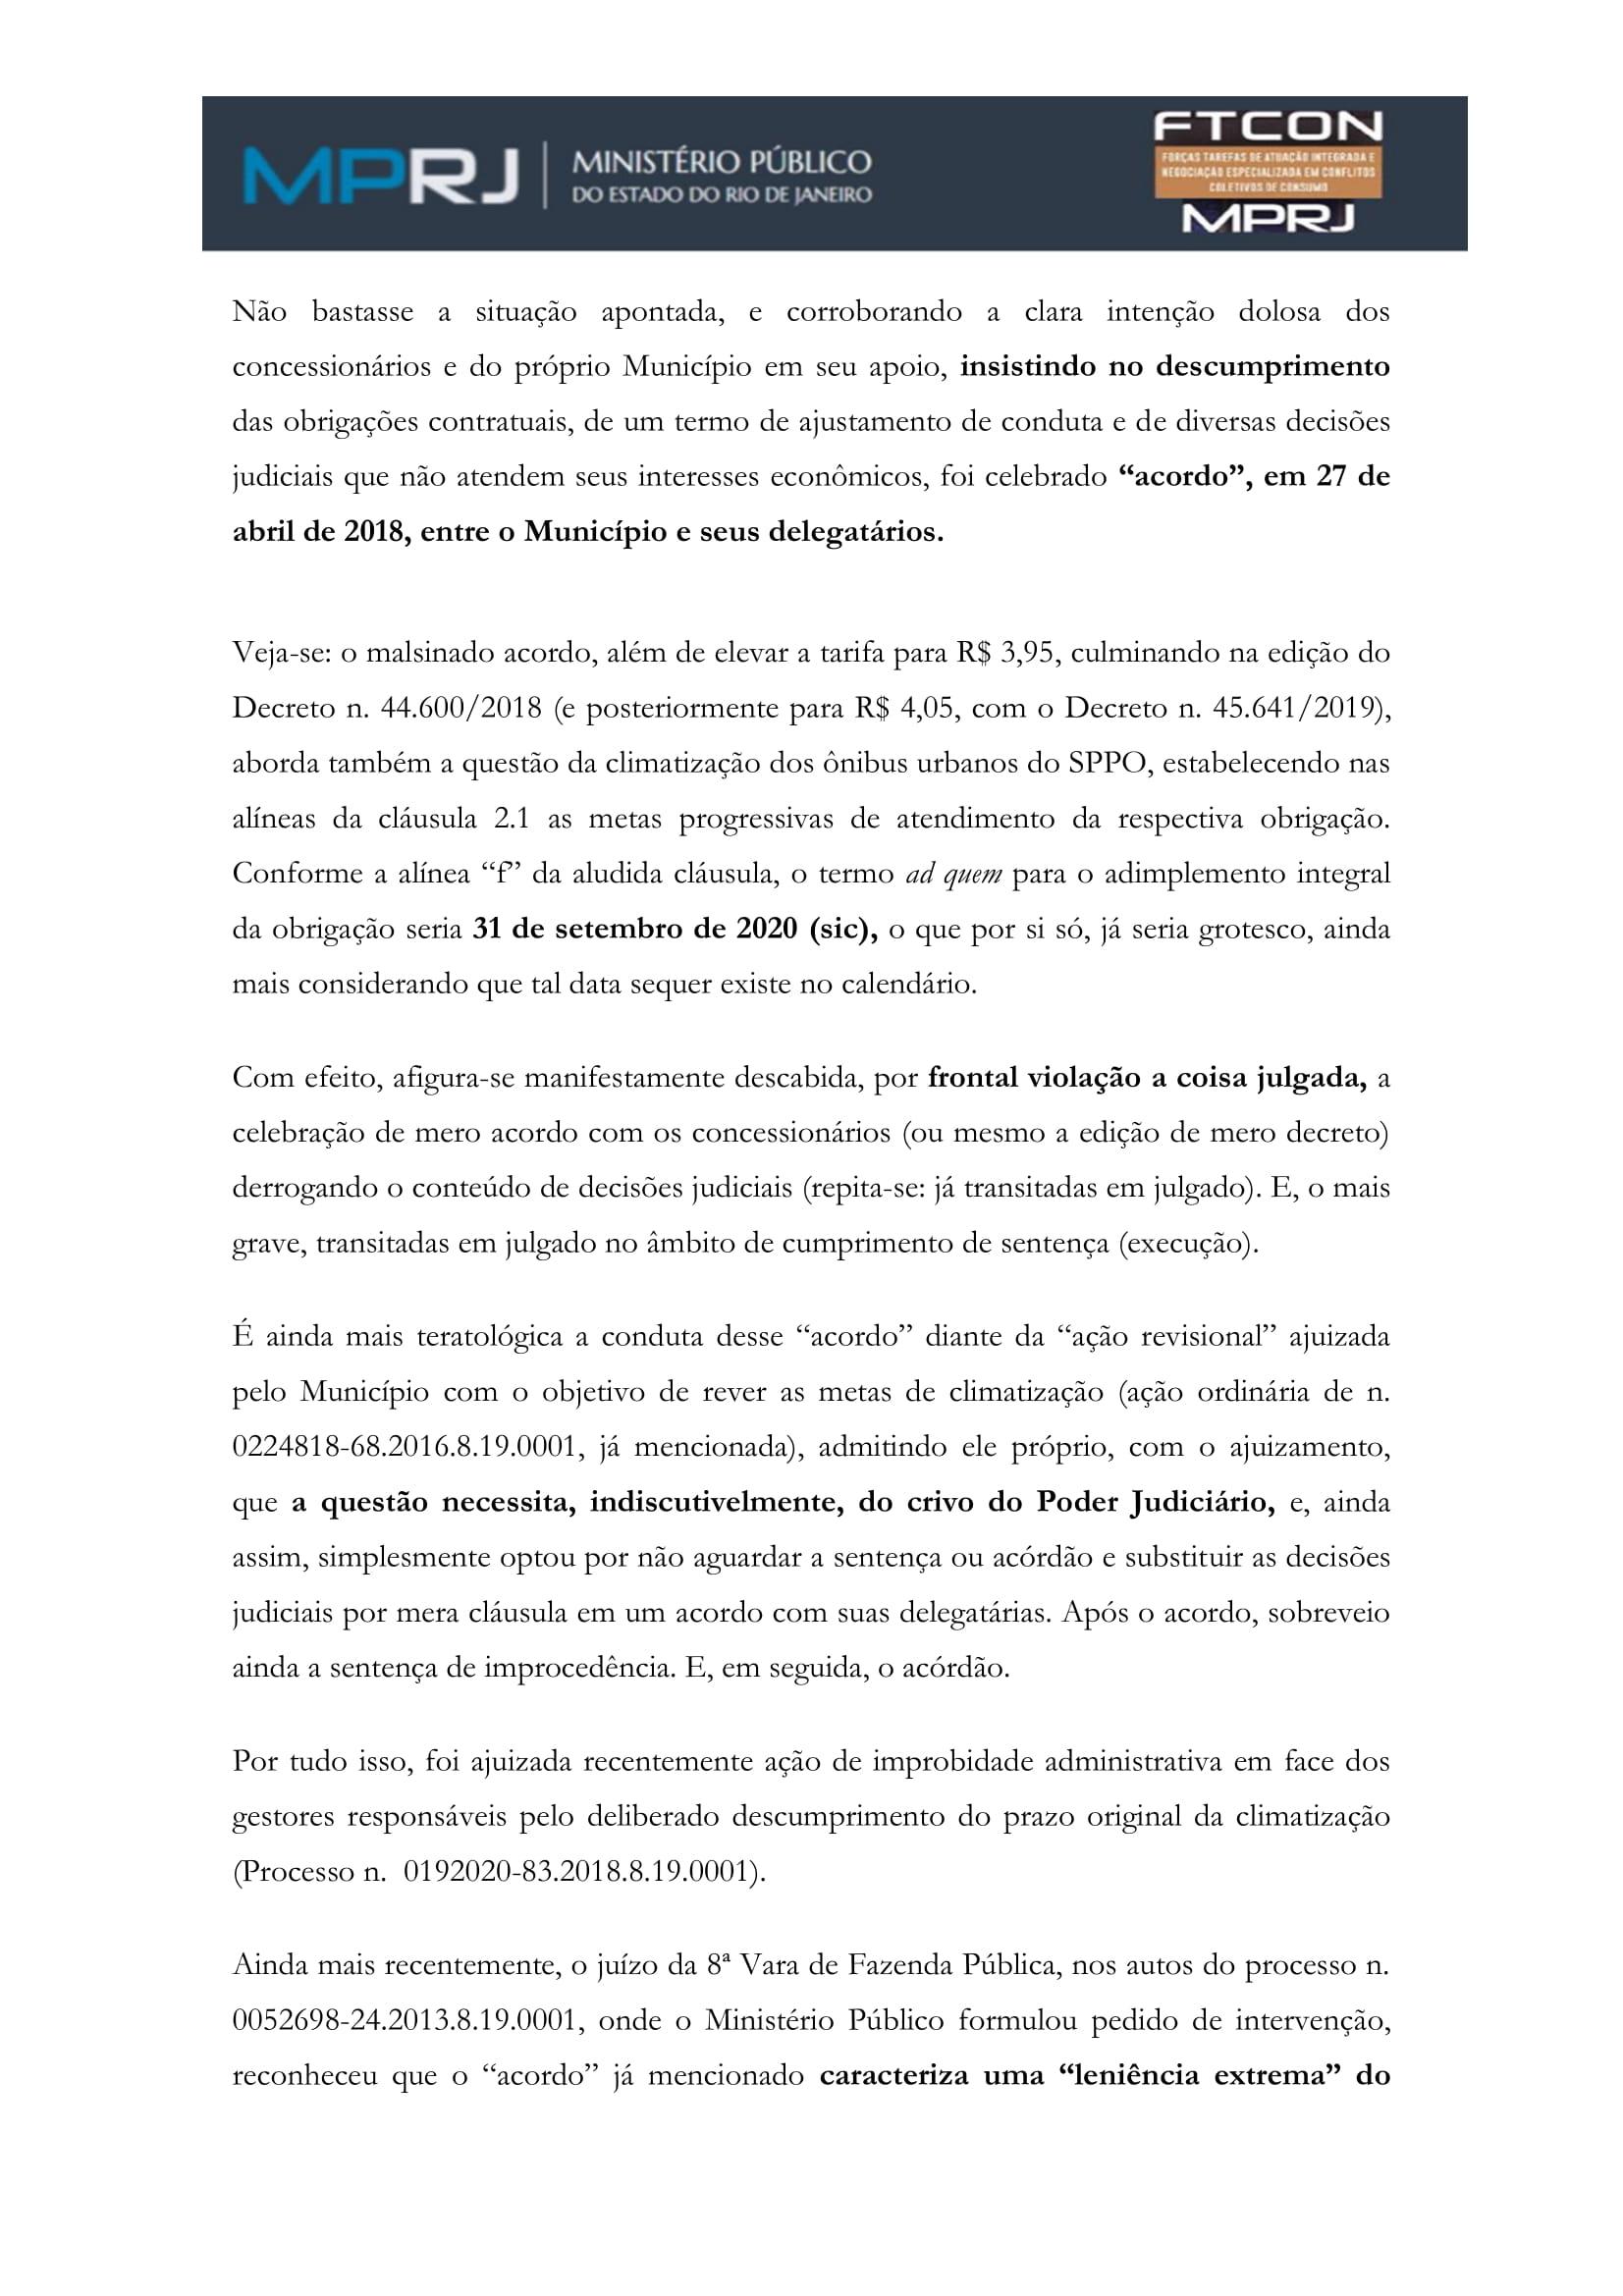 acp_caducidade_onibus_dr_rt-042